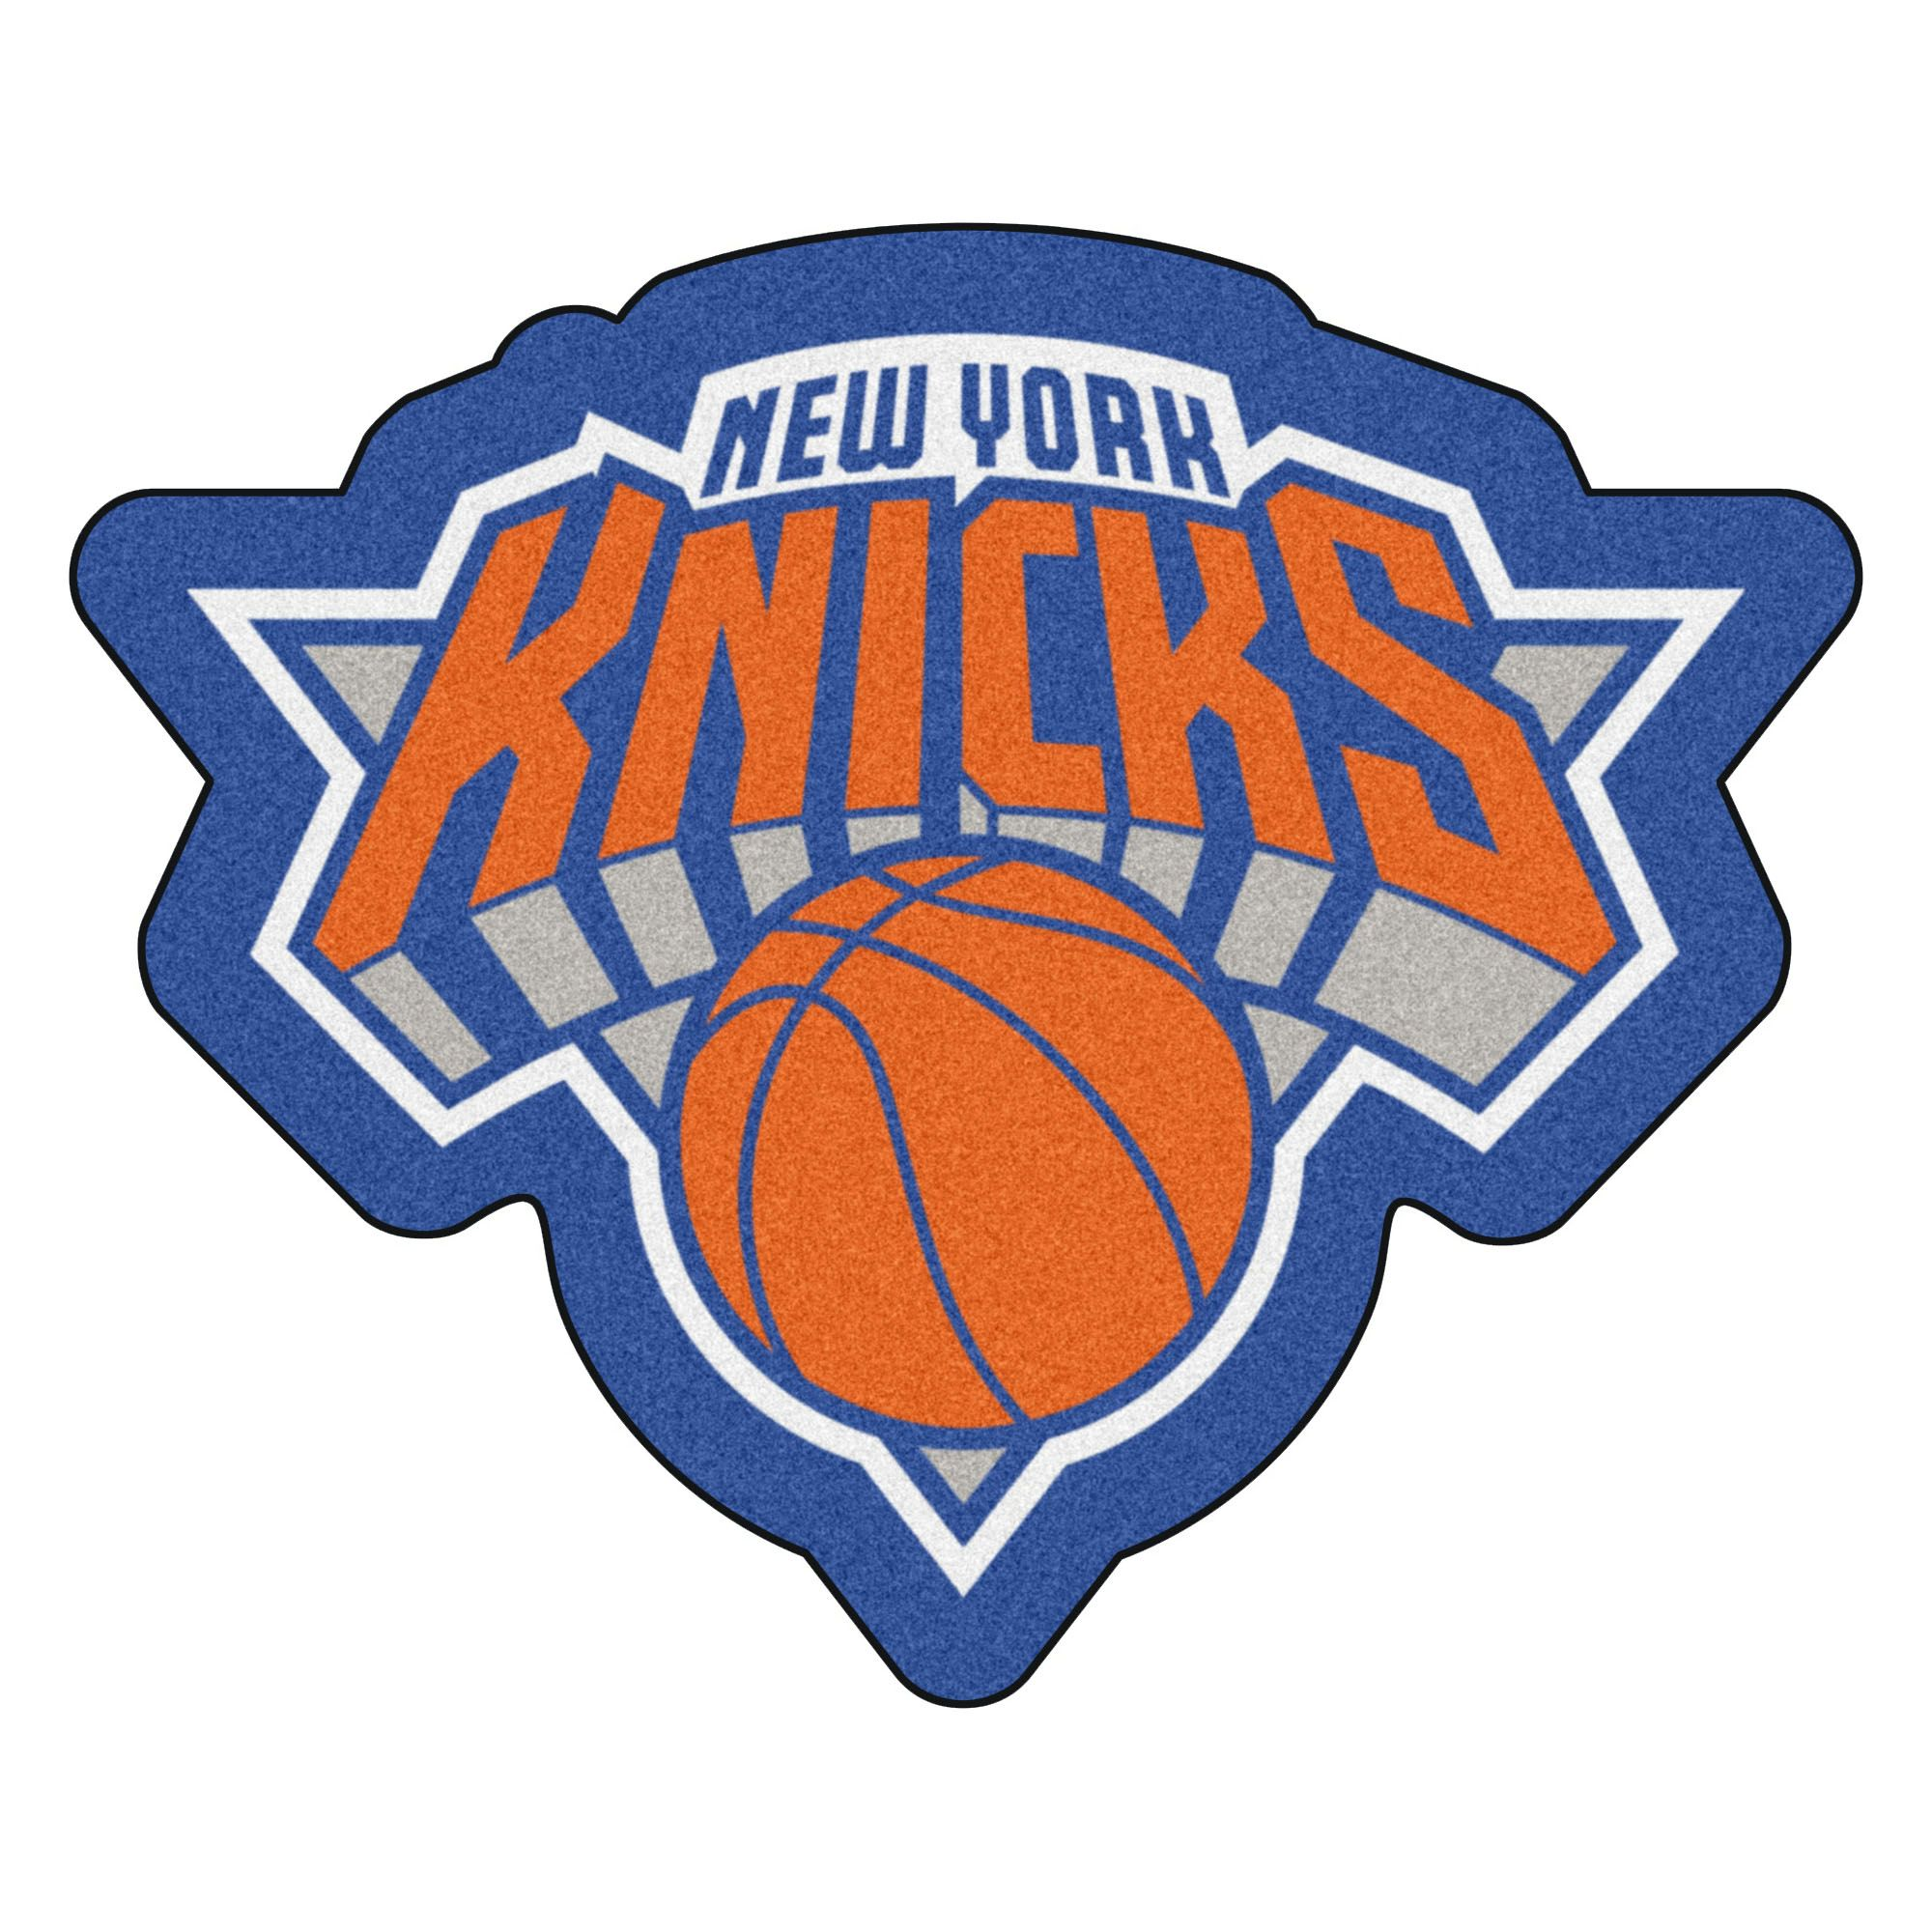 Nba New York Knicks Mascot Novelty Logo Shaped Area Rug In 2020 Nba New York New York Knicks Knicks Team